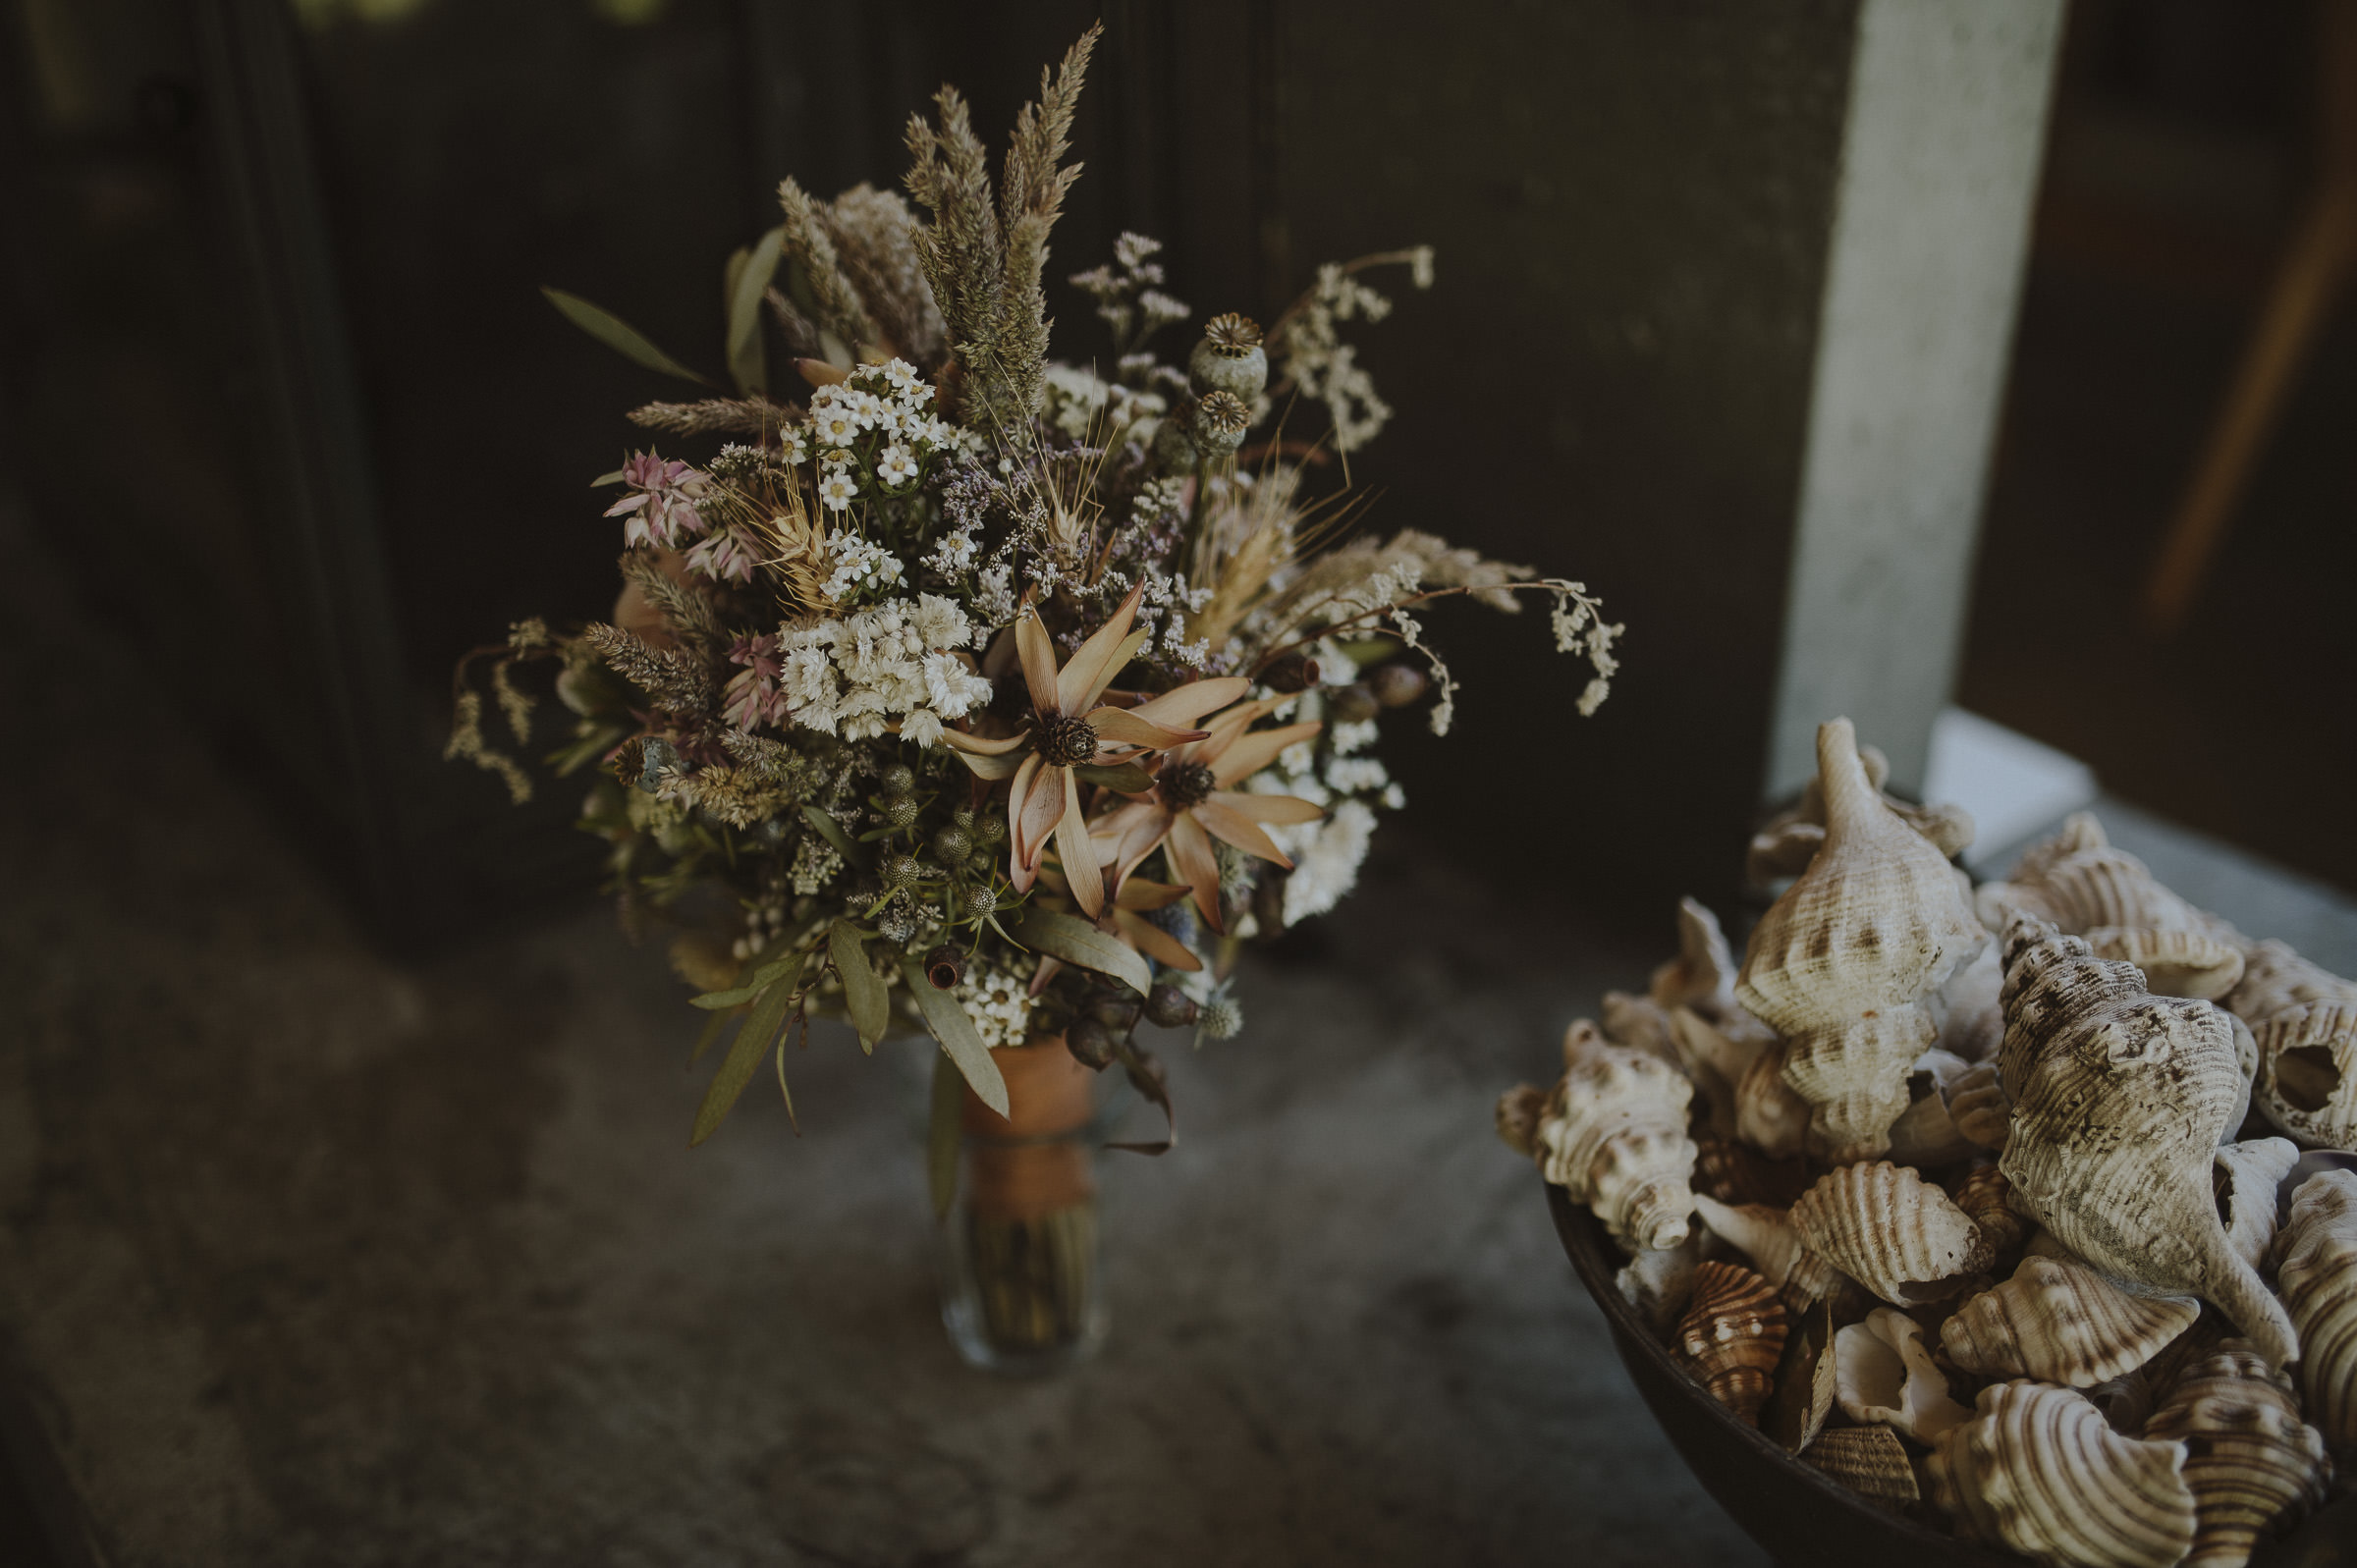 Jack_Millie_Seal_Rocks_Wedding_Photographer_Blog-13.jpg